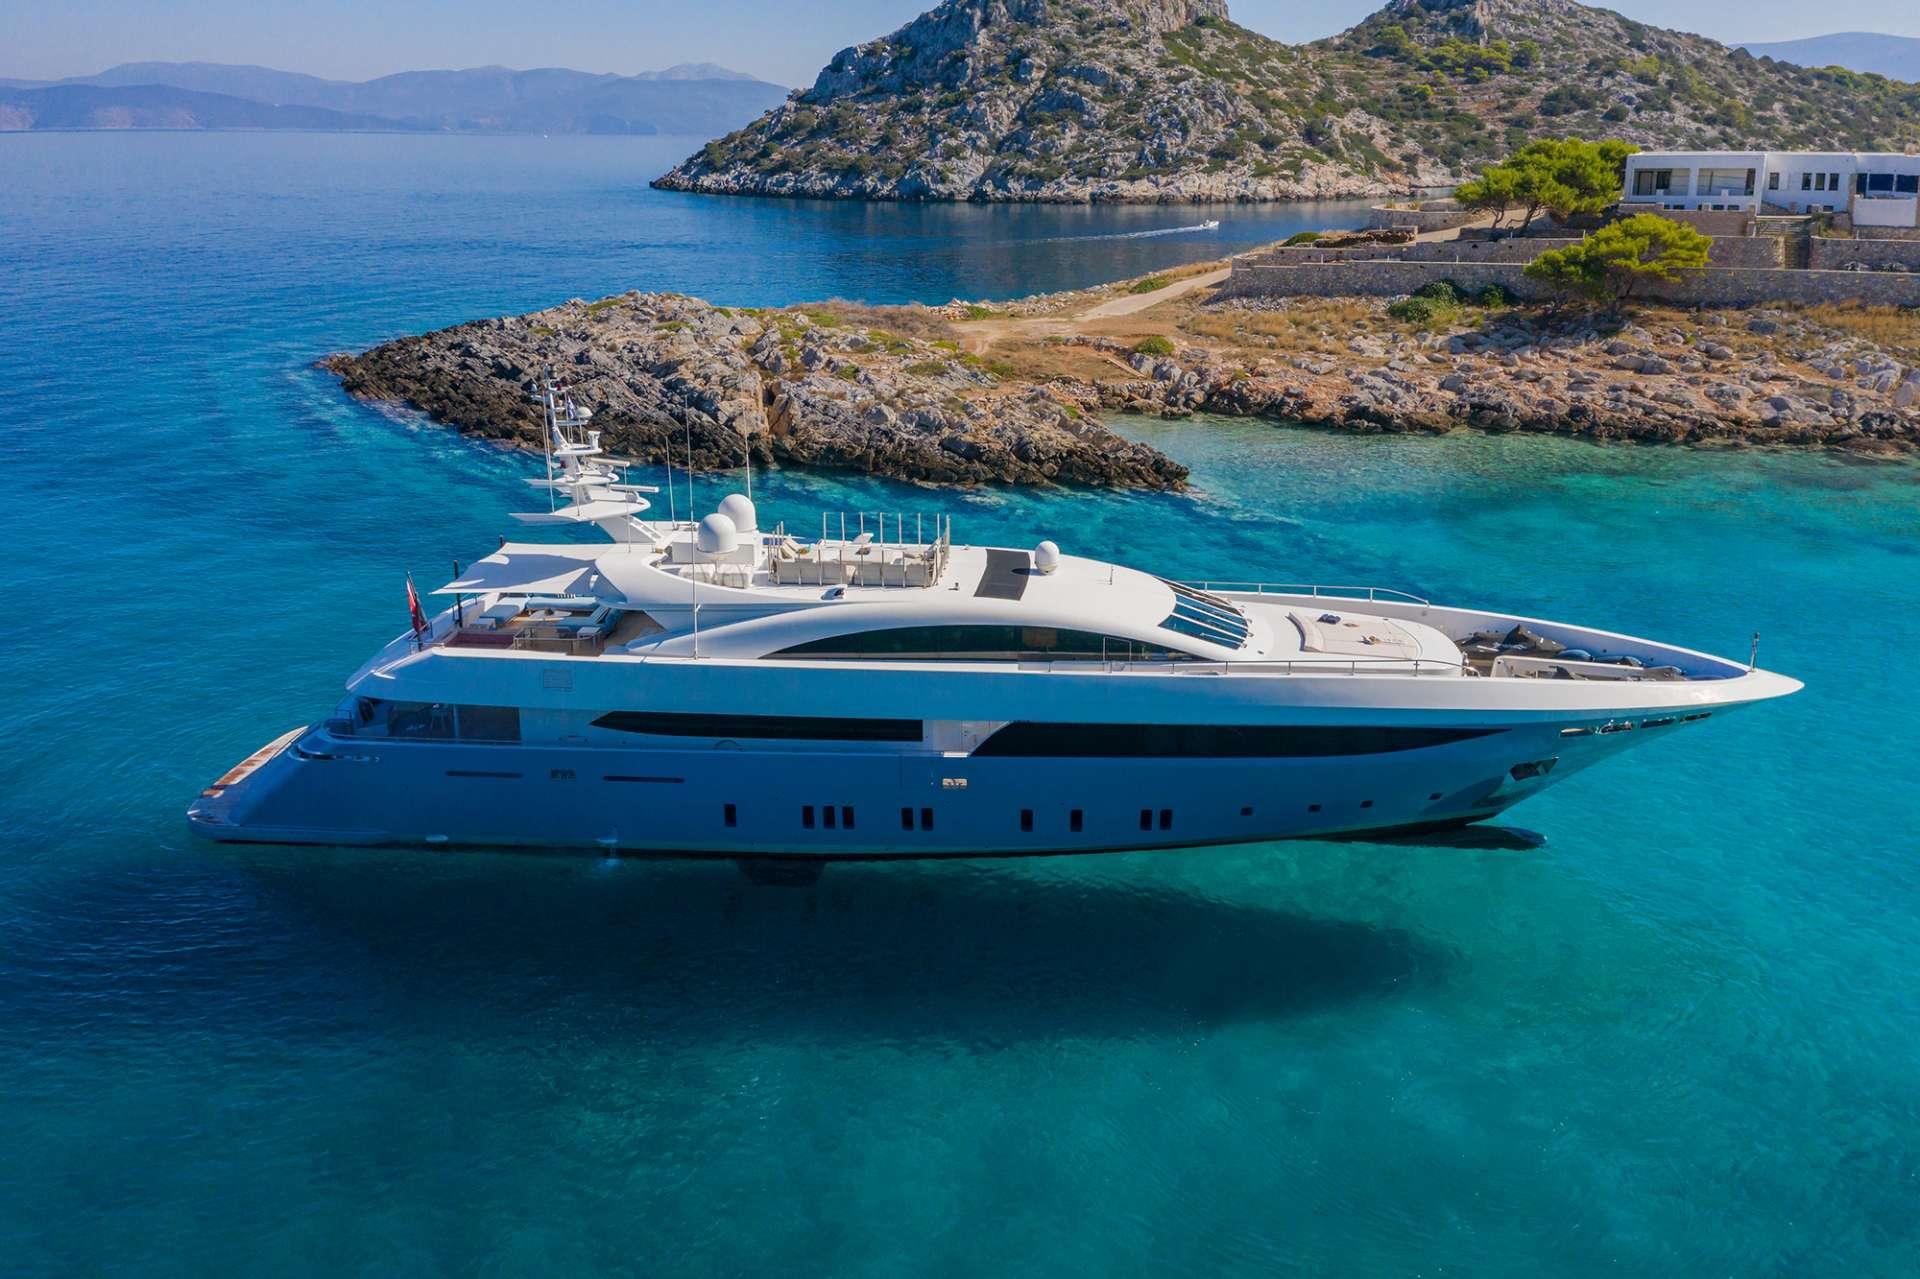 Power Yacht 'Power', 12 PAX, 8 Crew, 136.00 Ft, 41.00 Meters, Built 2008, Mondomarine, Refit Year 2018